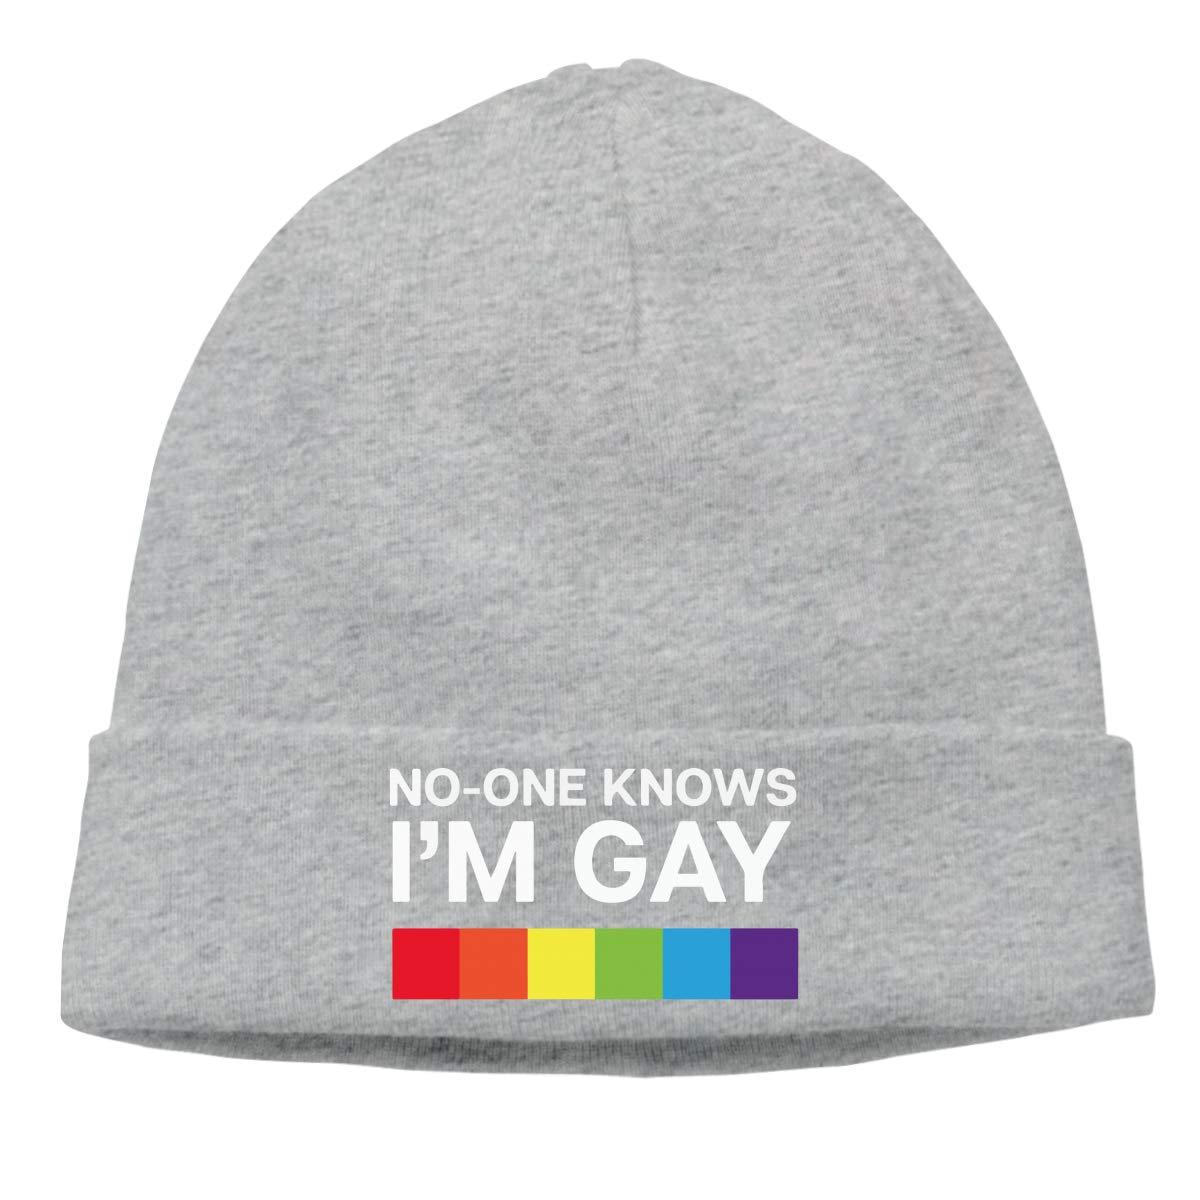 Men Women No One Knows Im Gay Soft Knit Beanie Caps